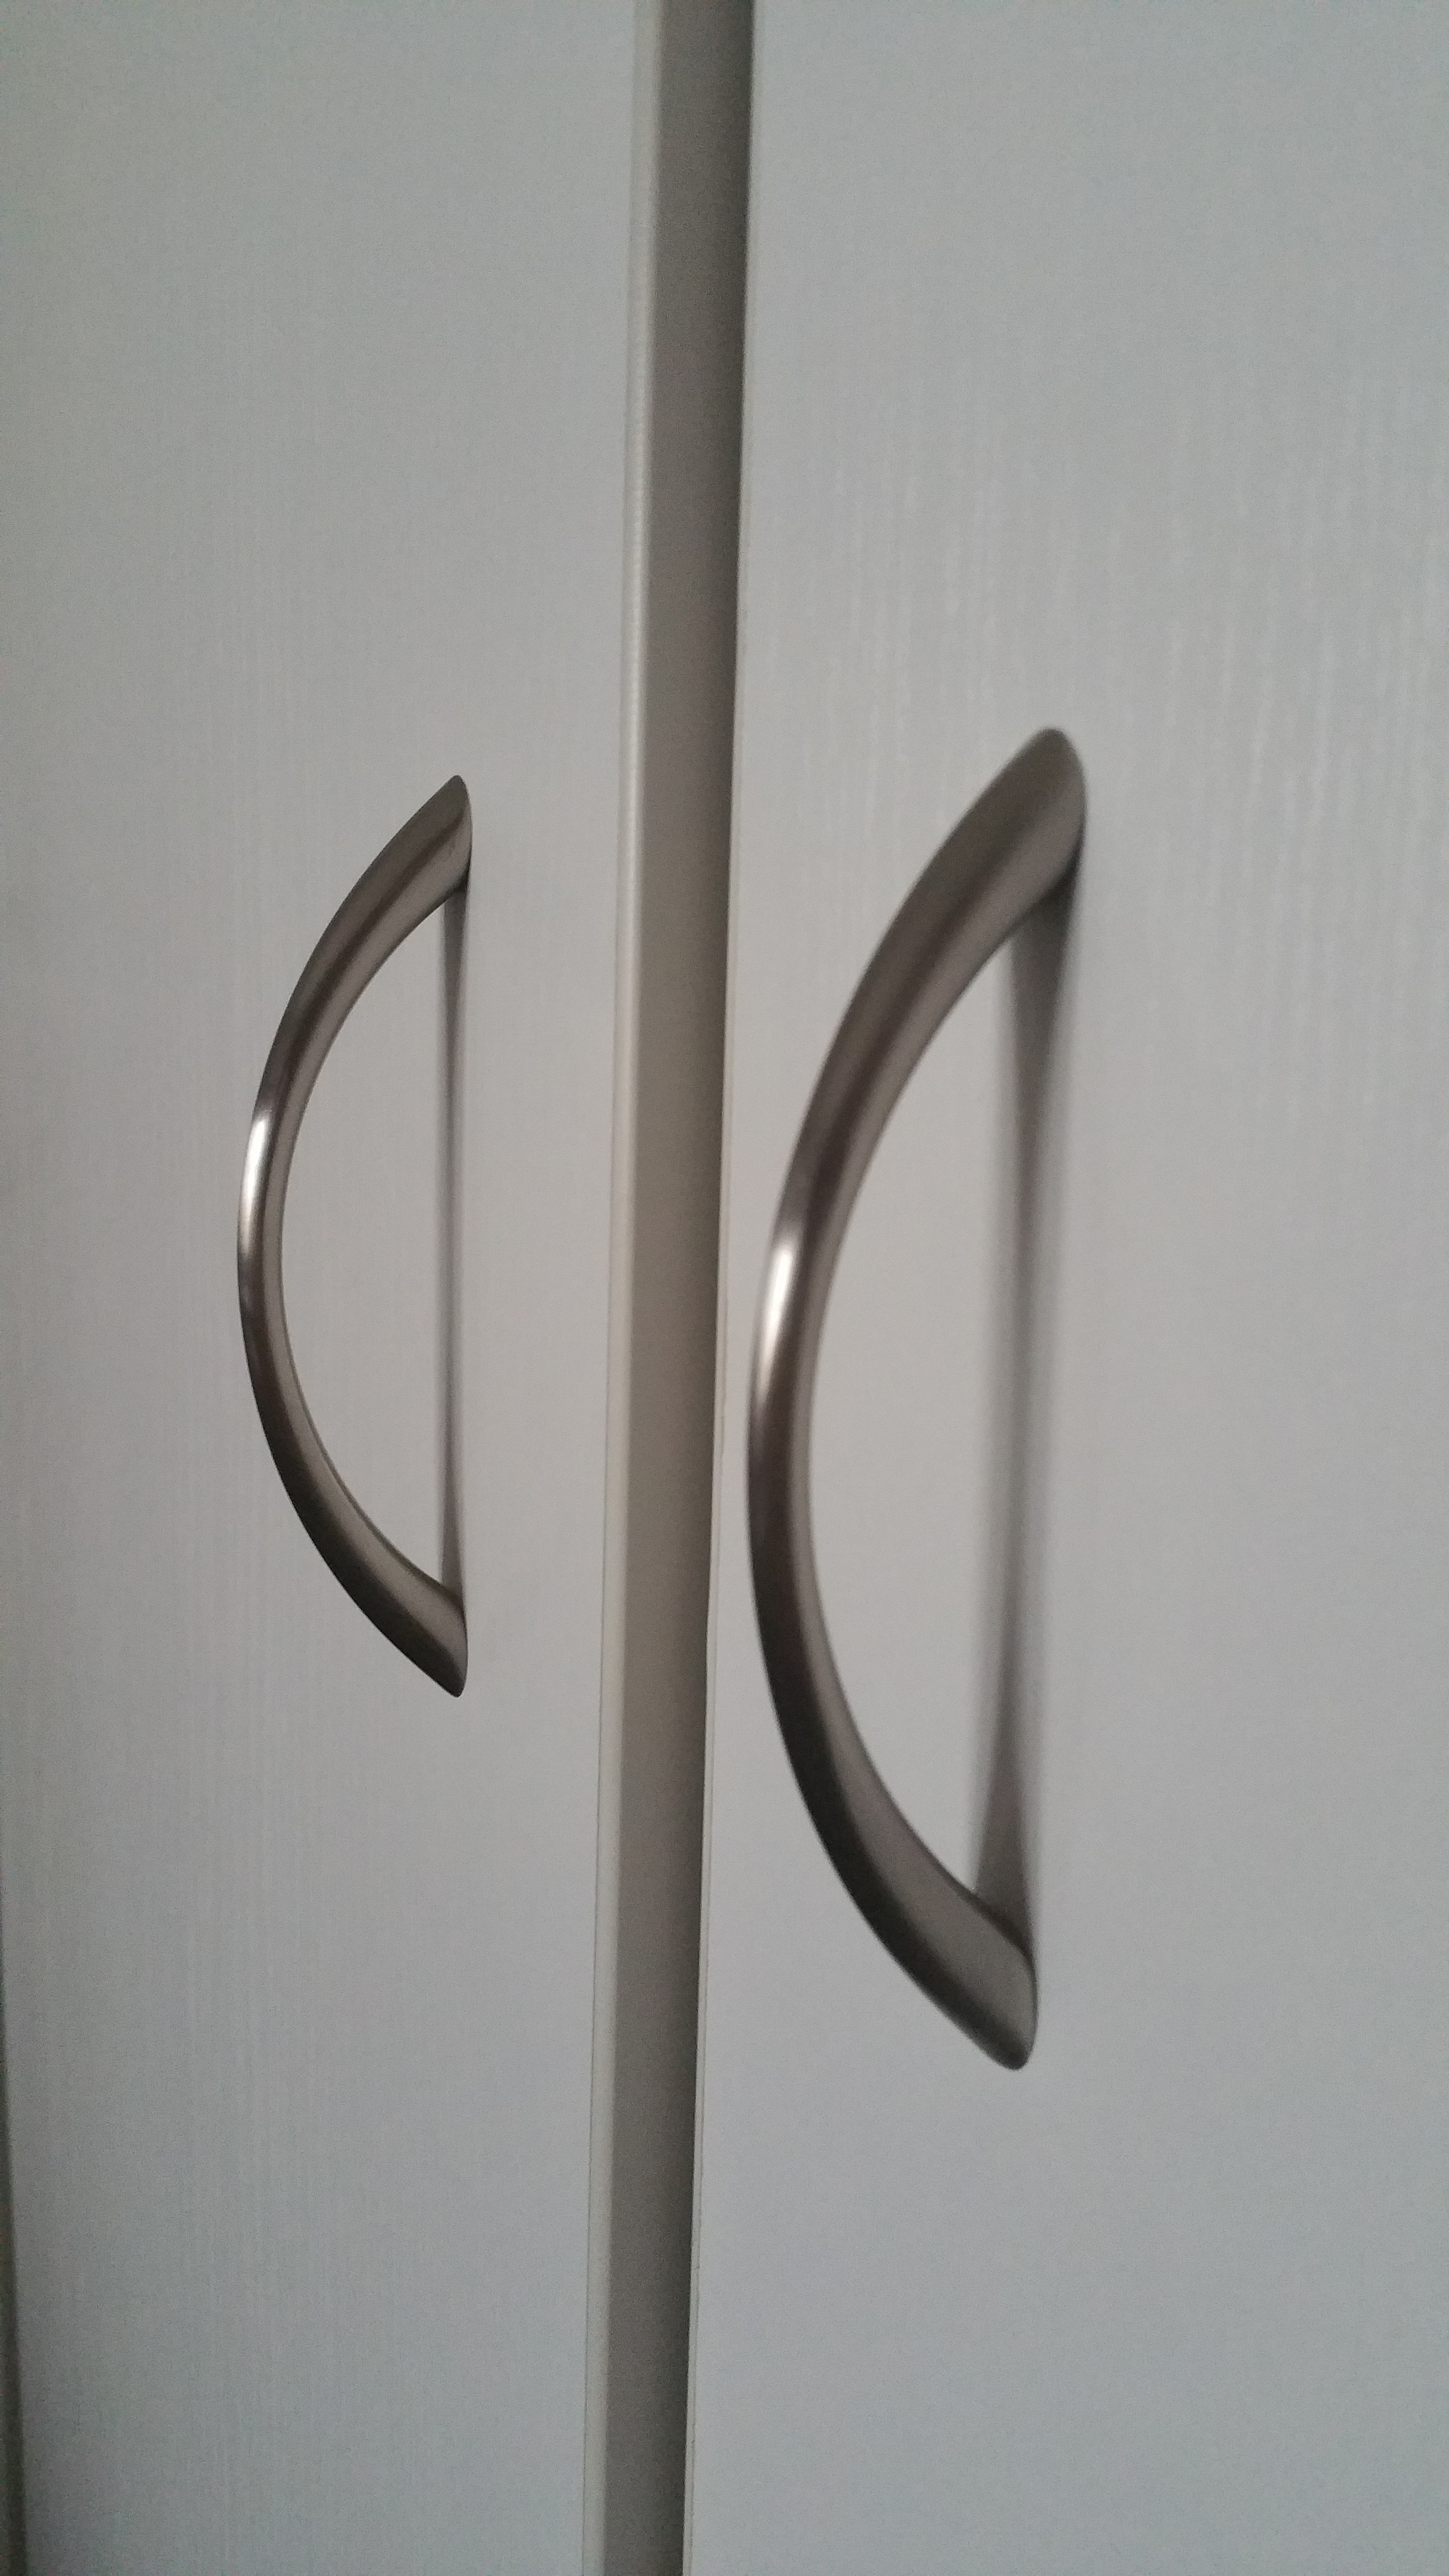 File:Modern Closet Handle